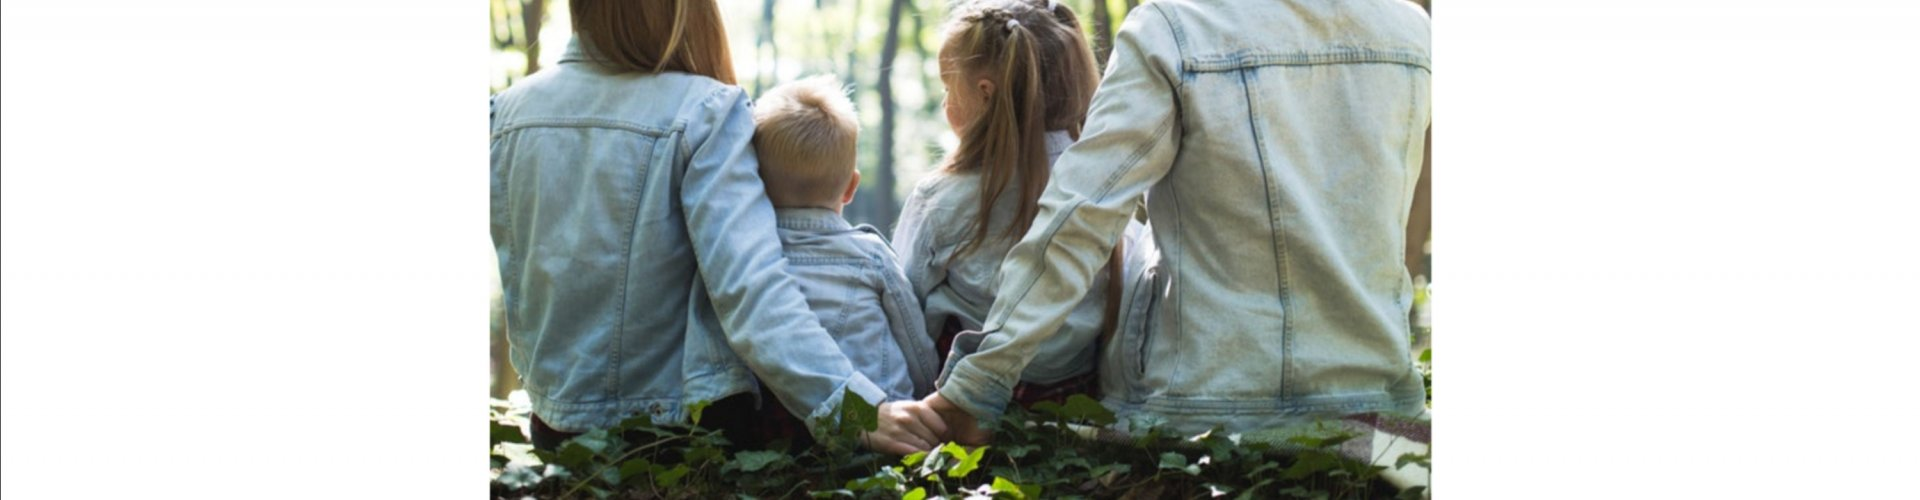 ouders ouderschap